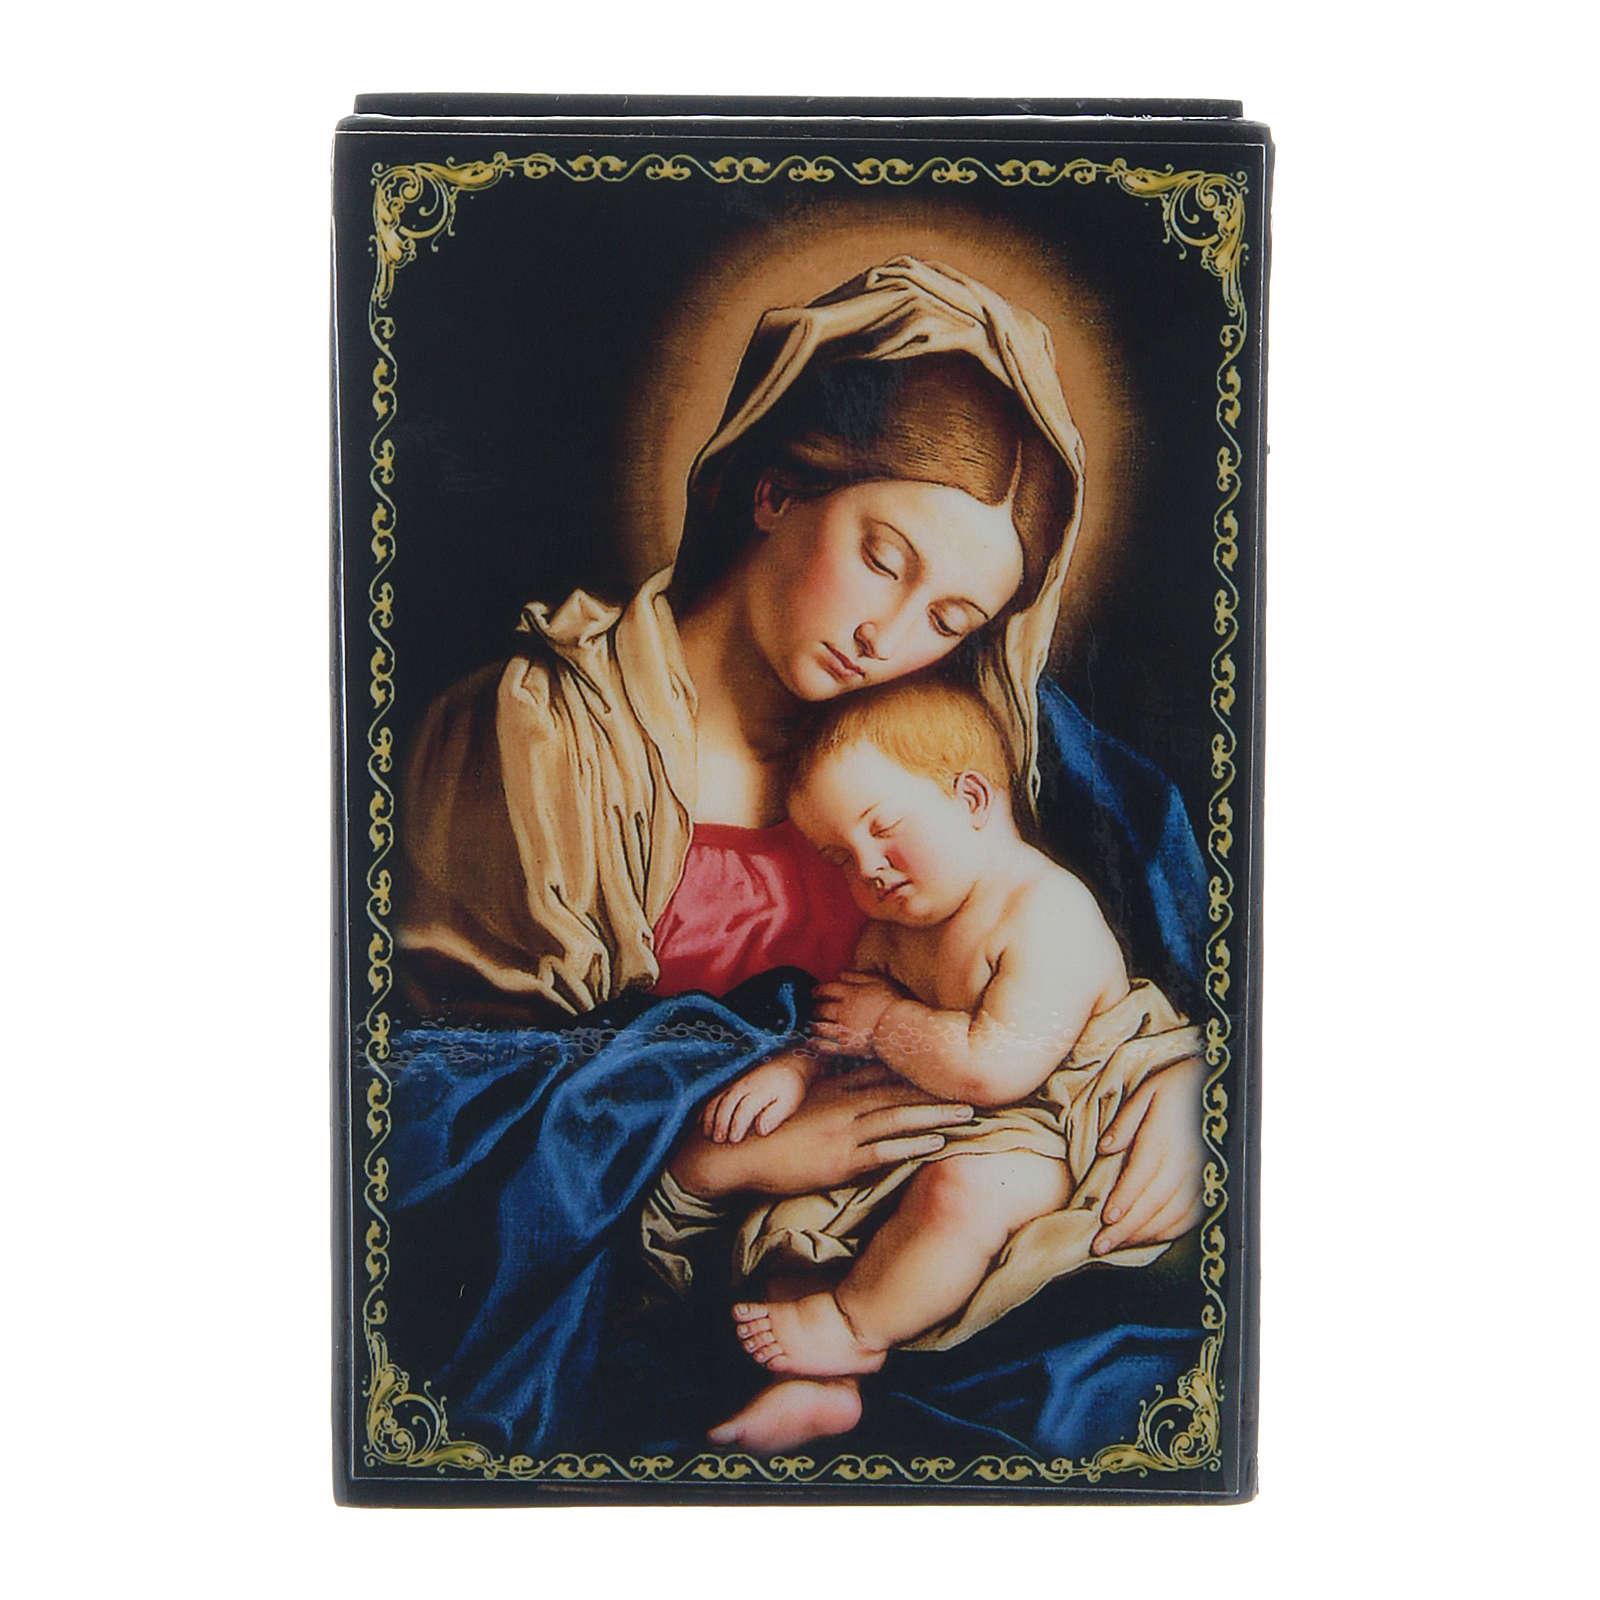 Russian papier-mâché and lacquer box Madonna with Child 9x6 cm 4